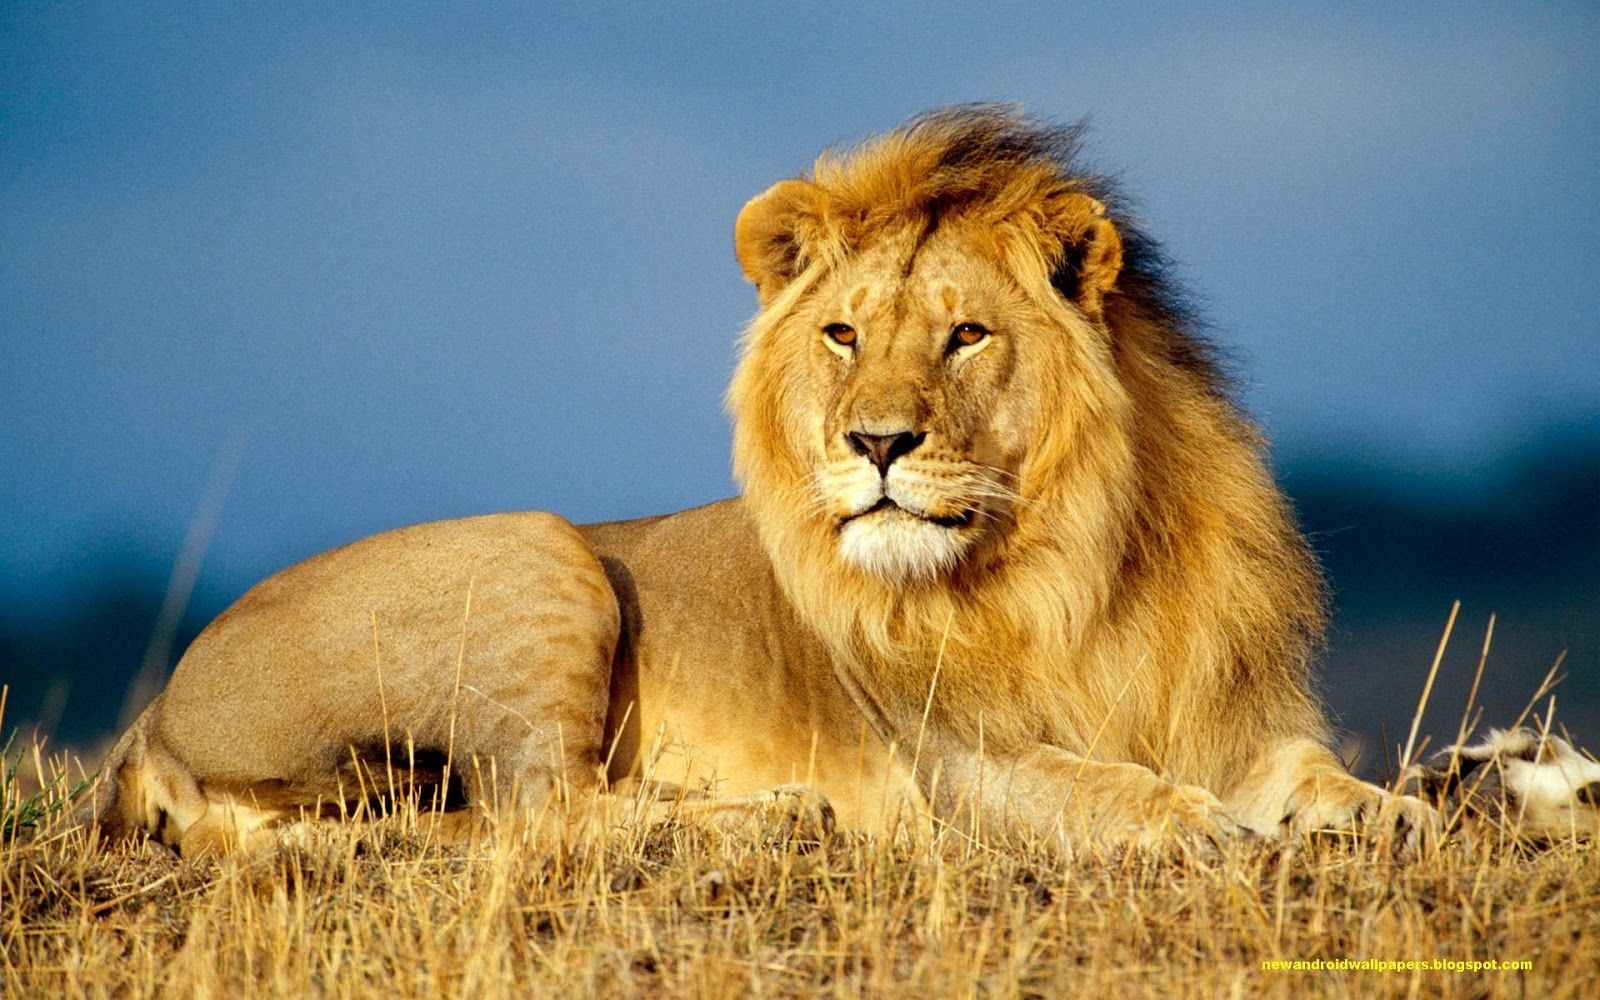 Mac Os X Lion Wallpapers × Mac Lion Wallpapers HD Животные